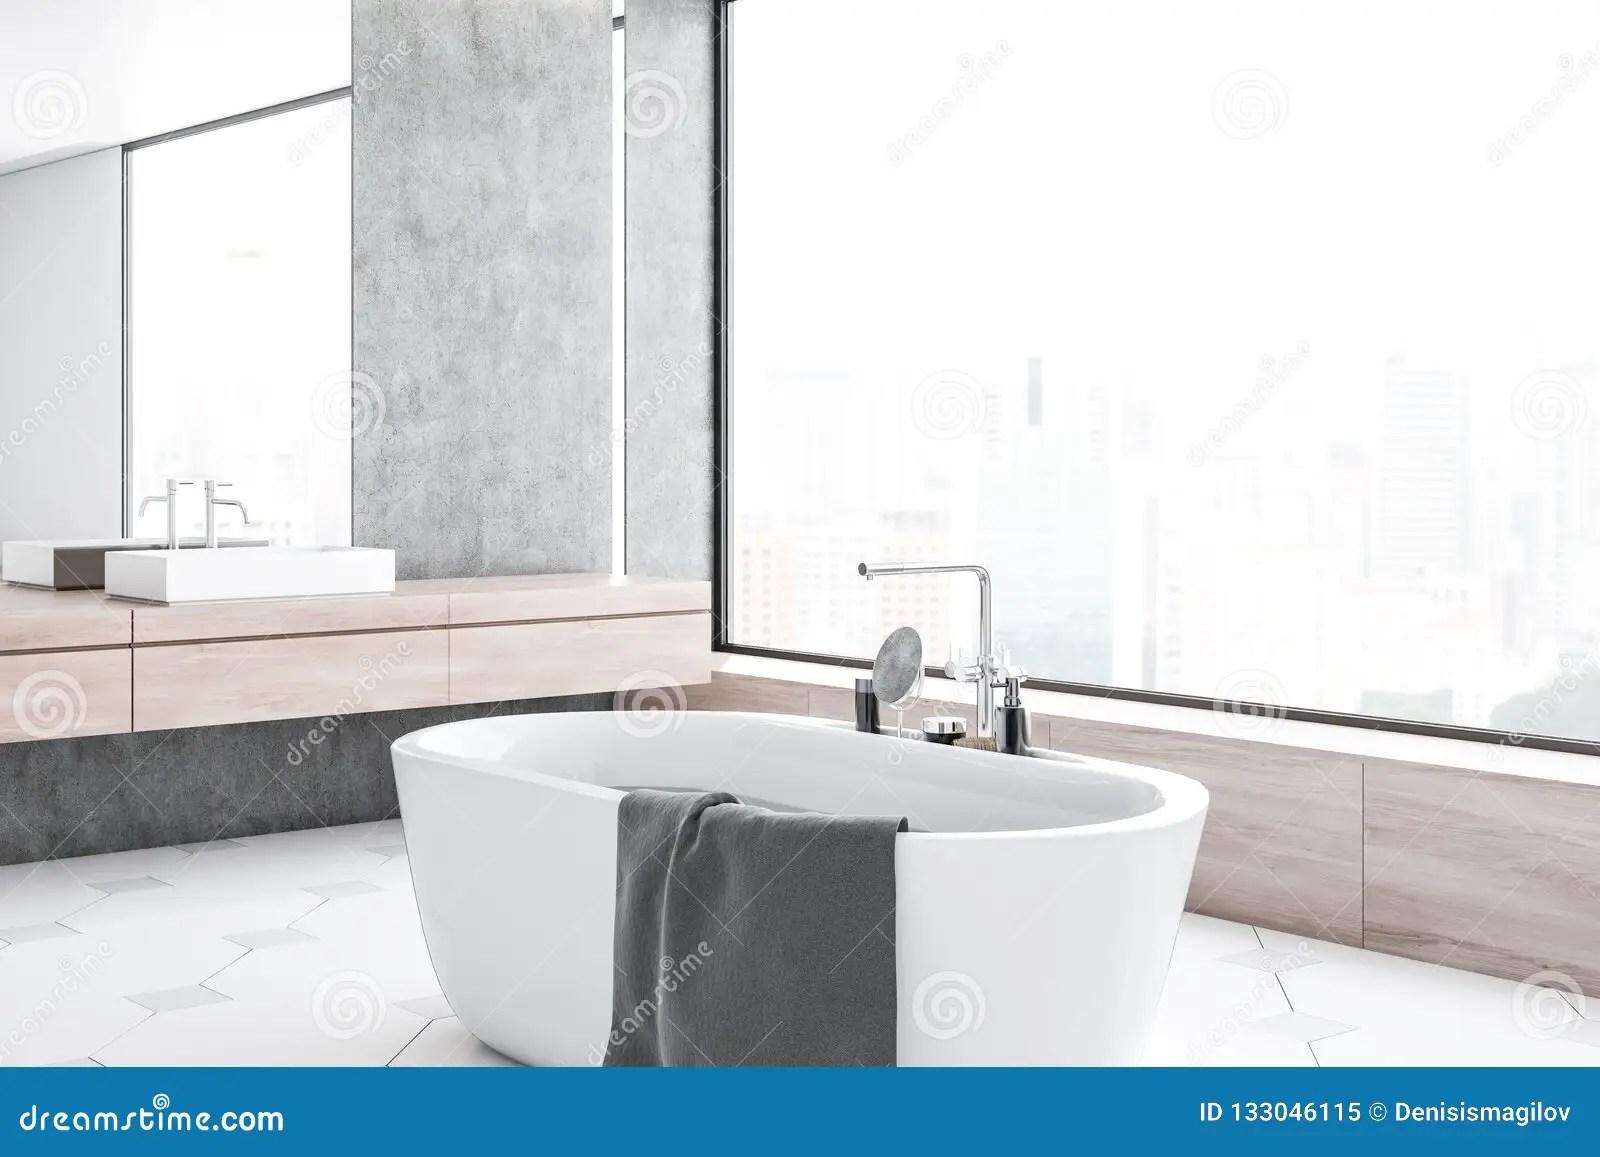 Concrete Bathroom Corner White Tub And Sink Stock